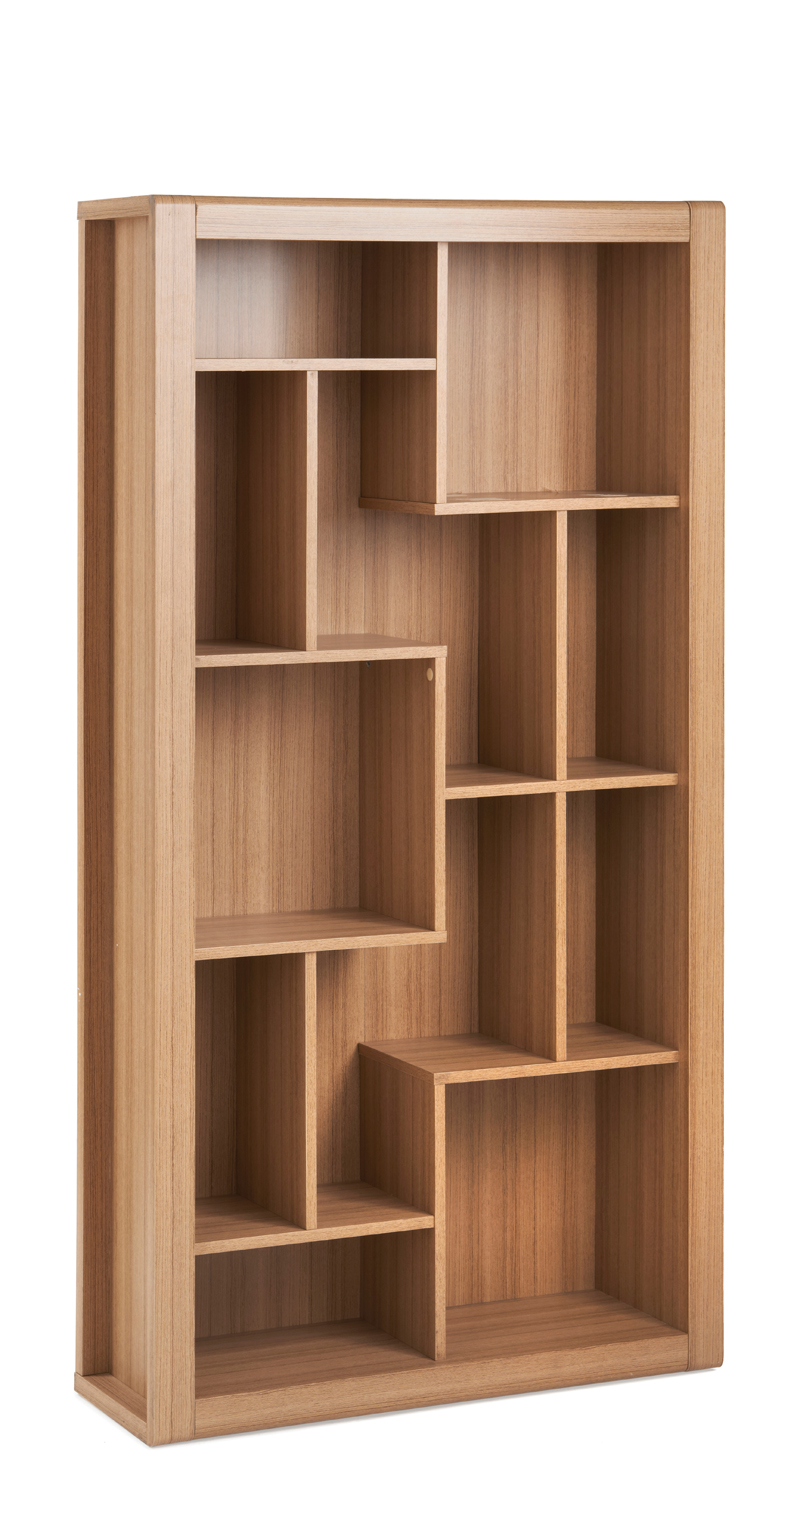 RIO Stylish Small/Home Office Luxury Oak Desk WorkStation Pedestal Book Case Set